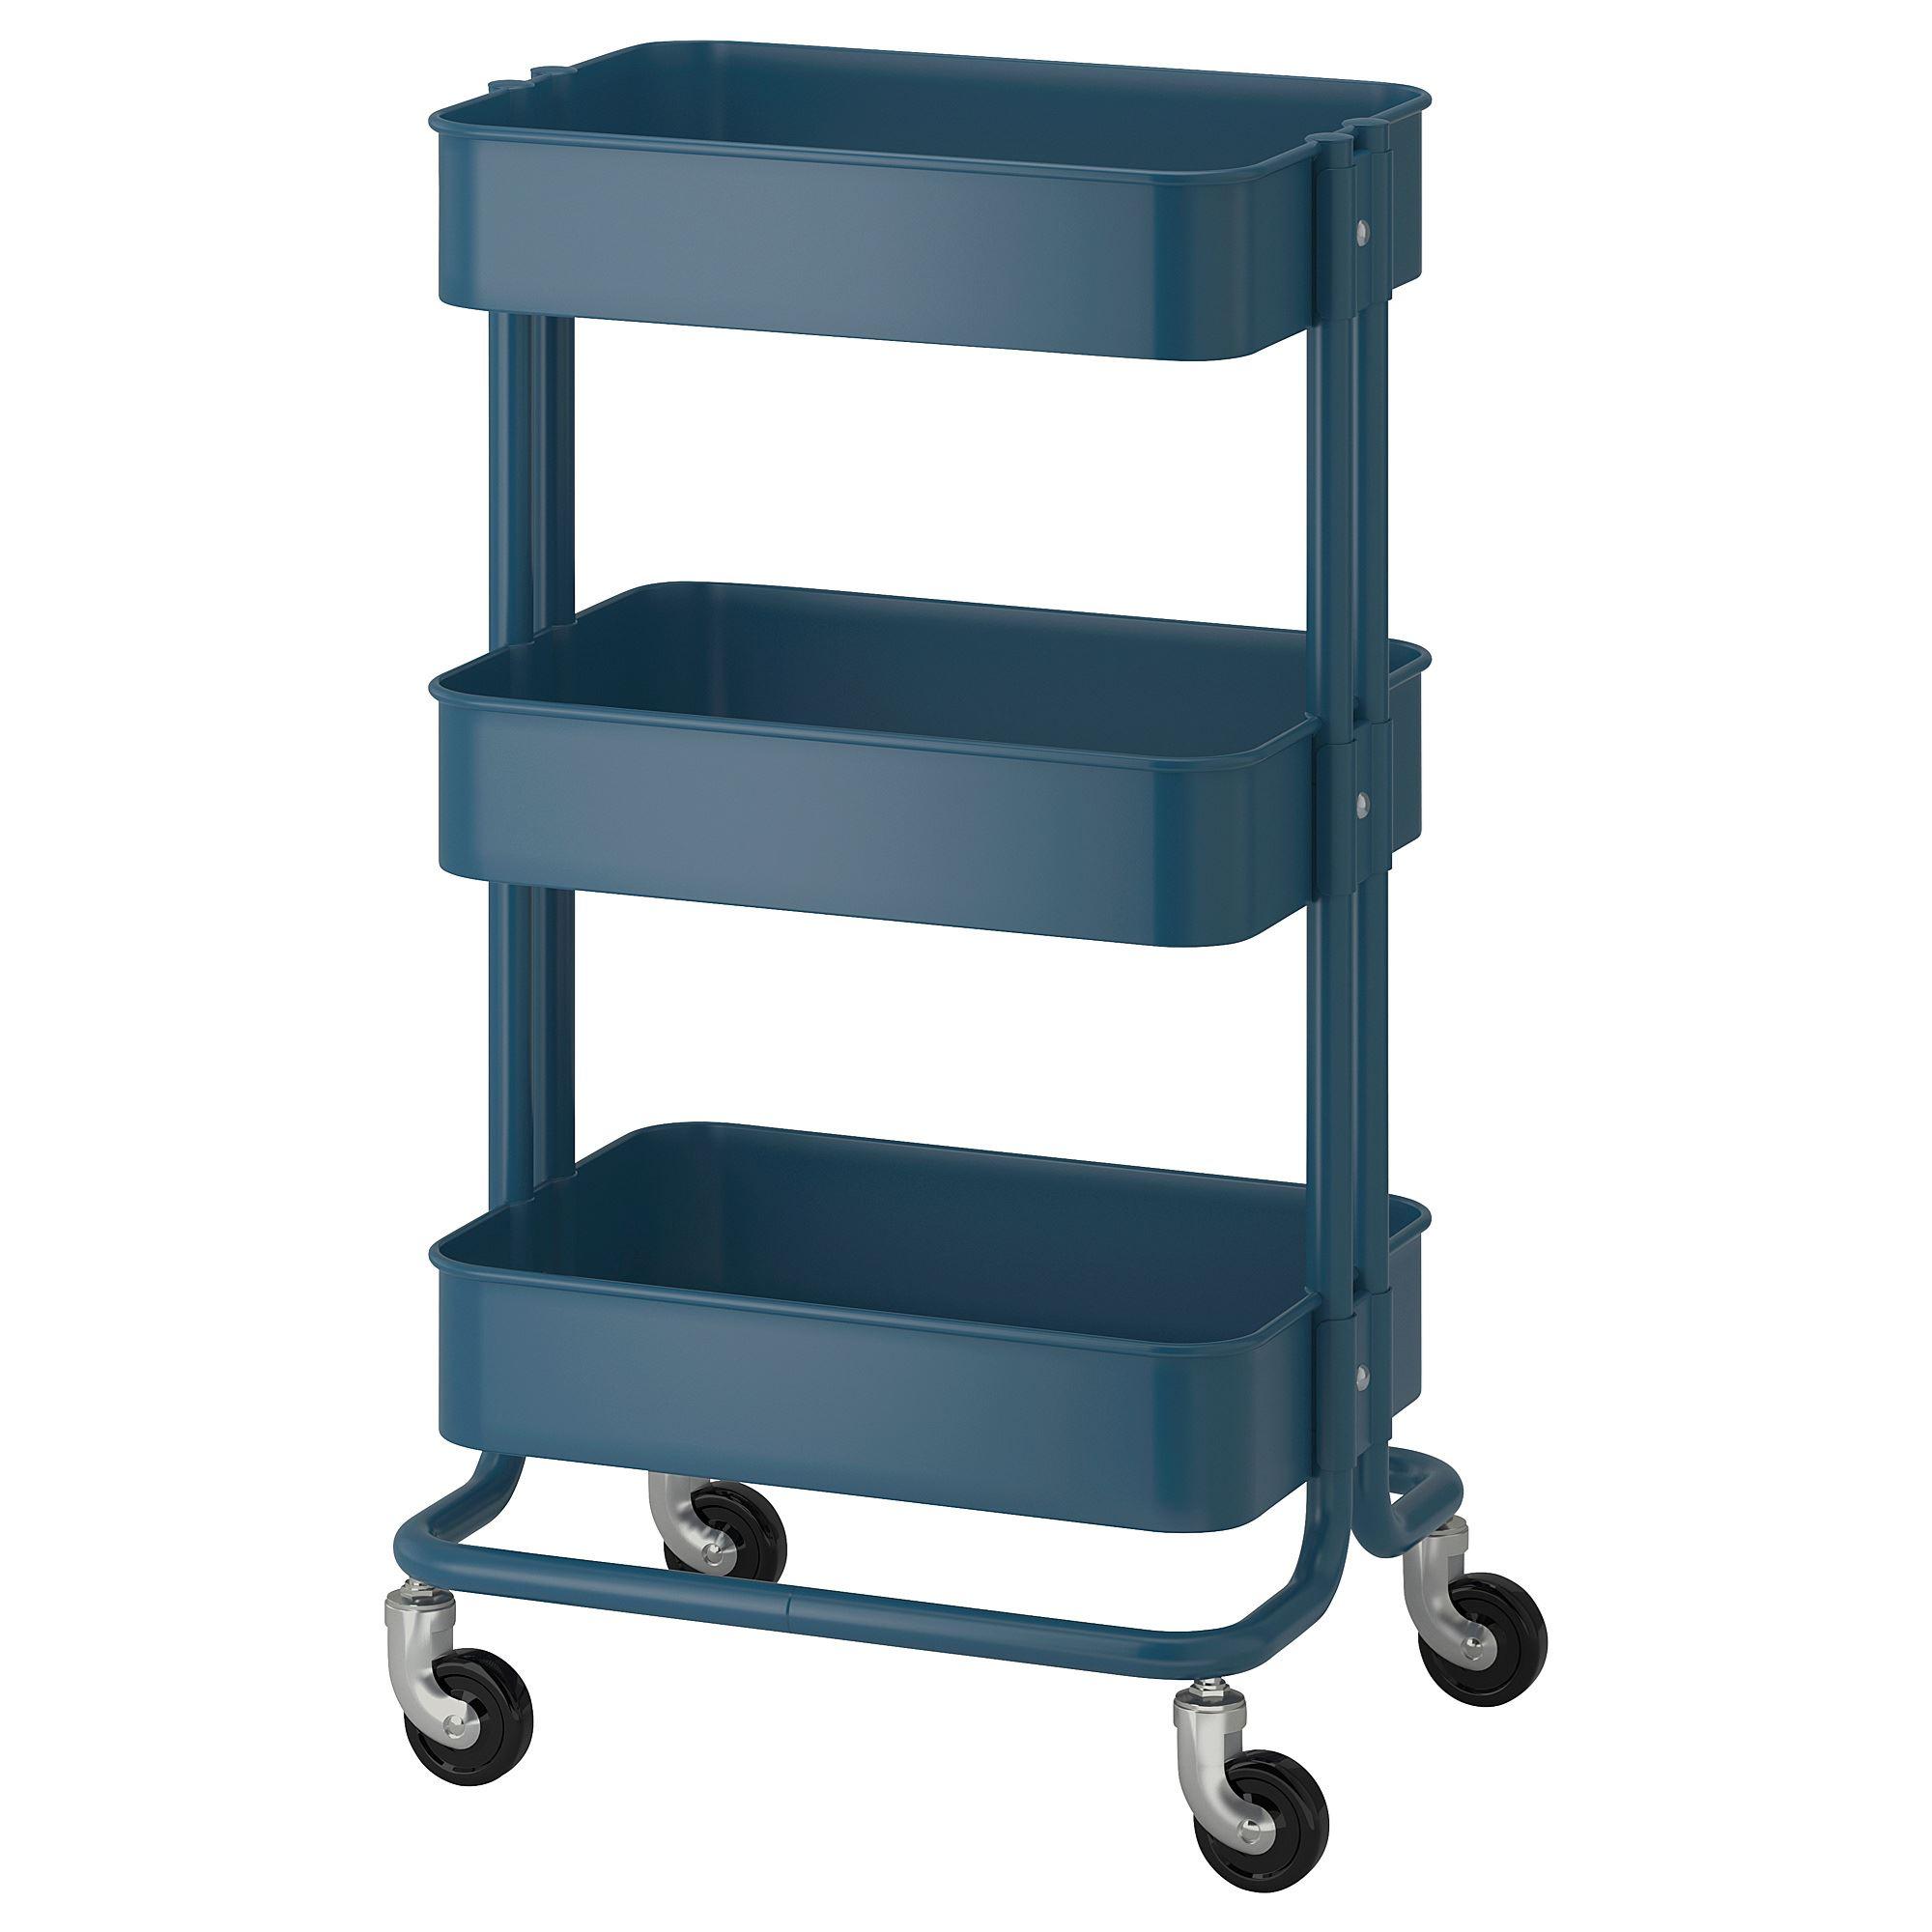 RASKOG trolley dark blue 35x45x78 cm | IKEA Kitchen